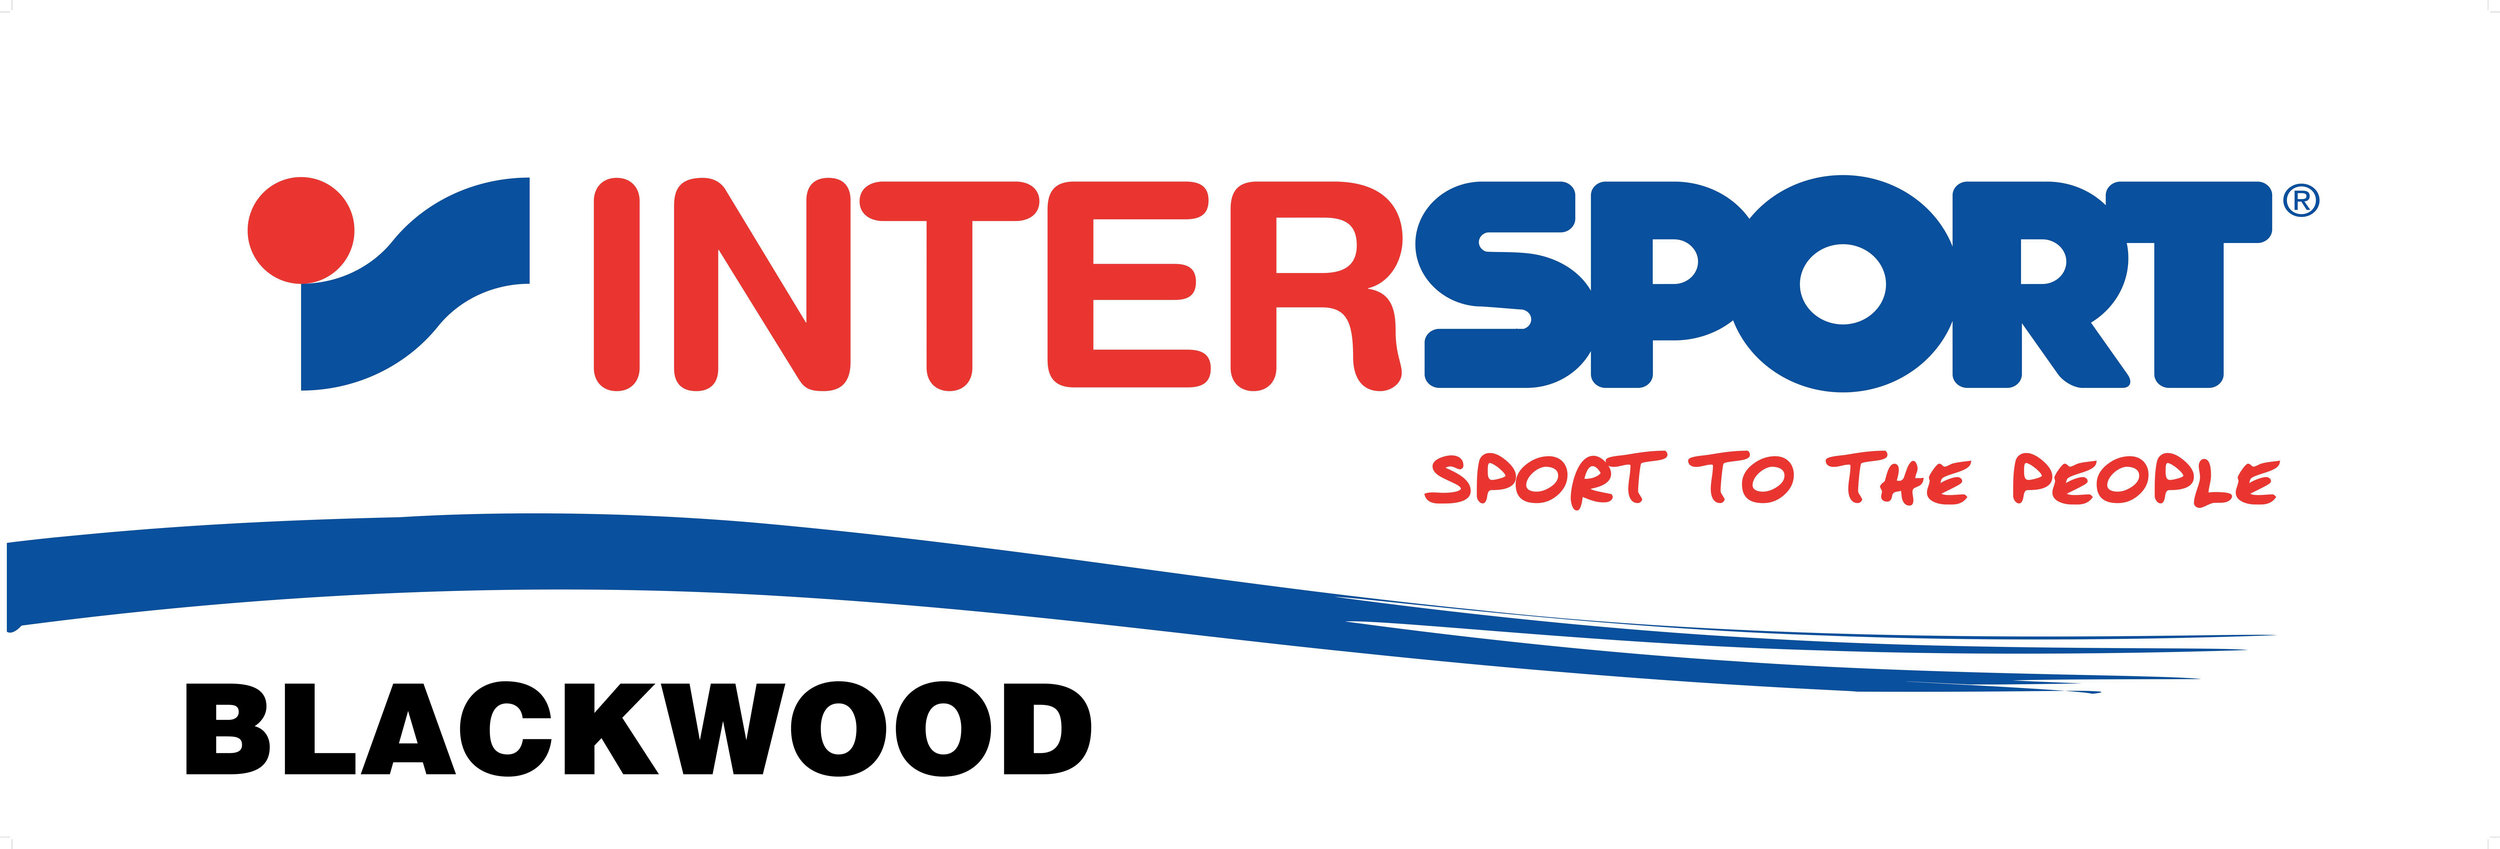 44258 Intersport Blackwood PROOF.jpg